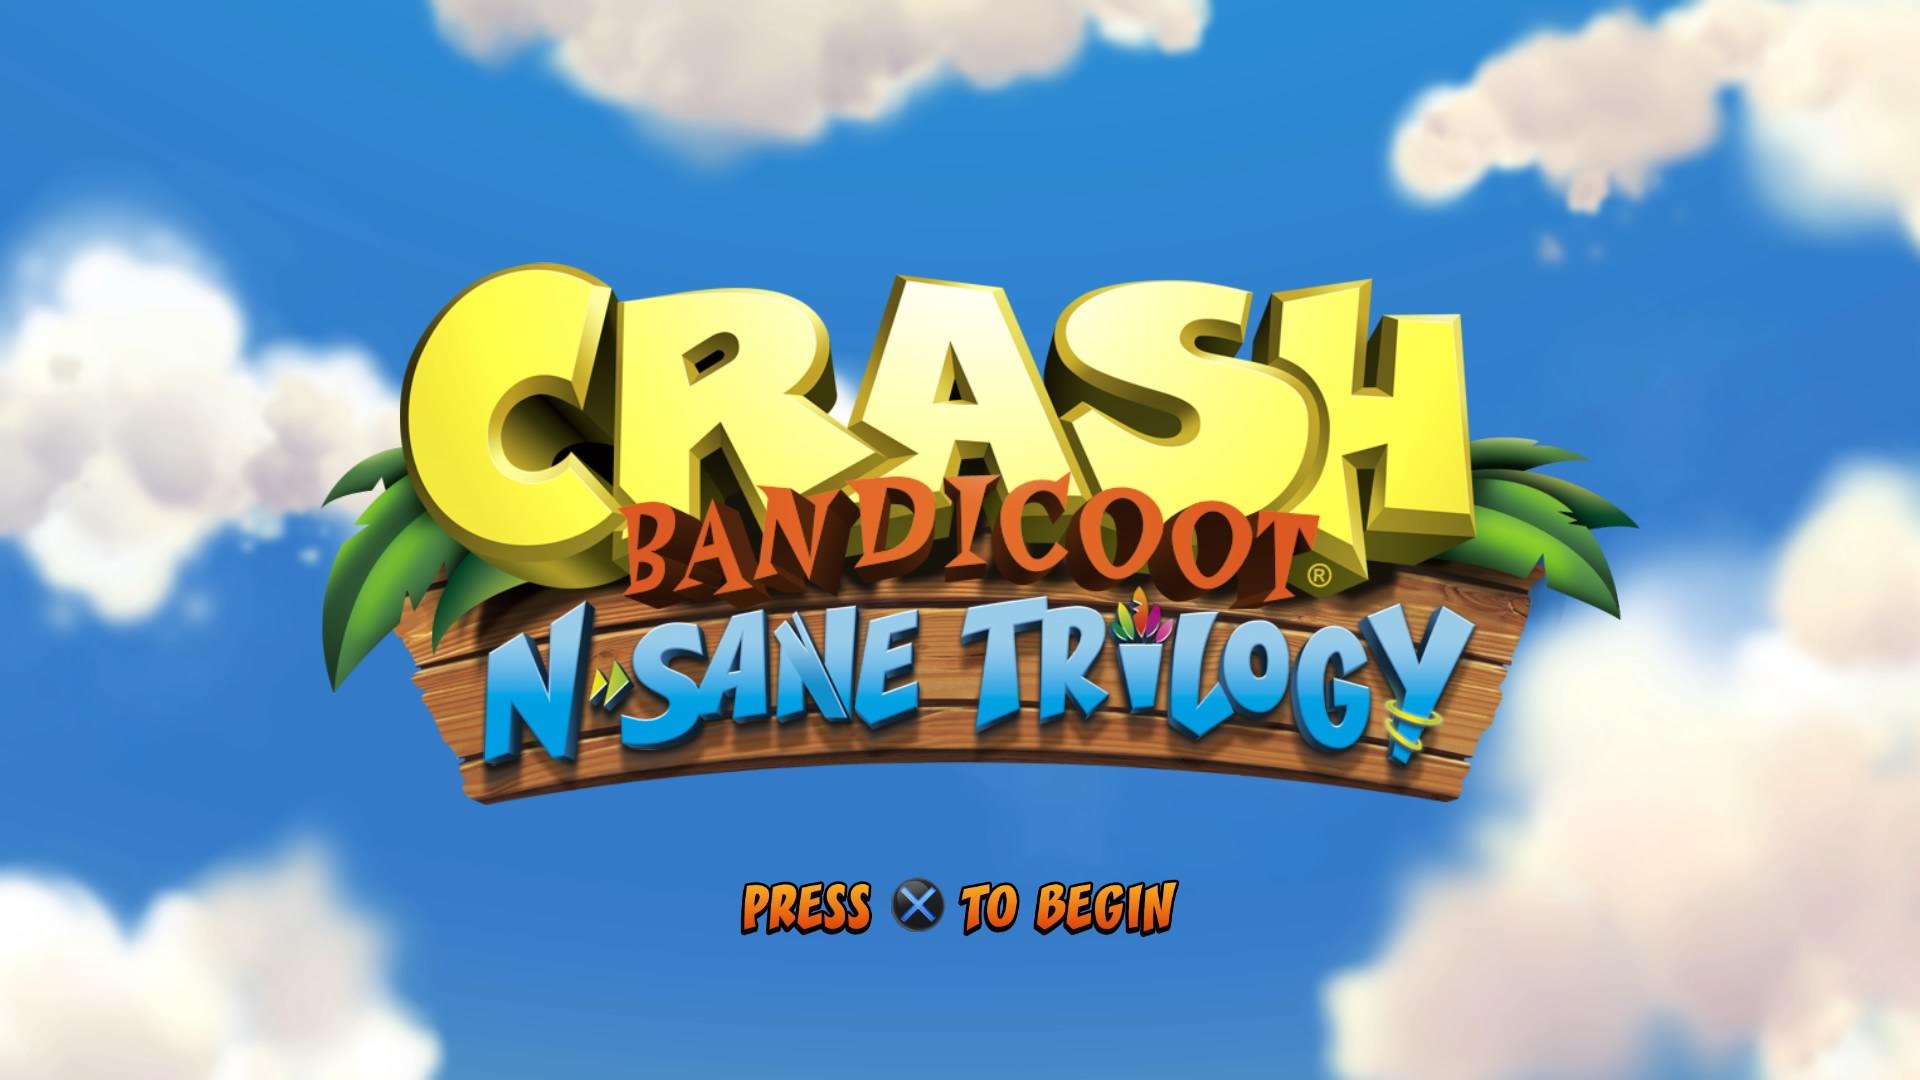 Crash Bandicoot N.Sane Trilogy – PS4 | Review